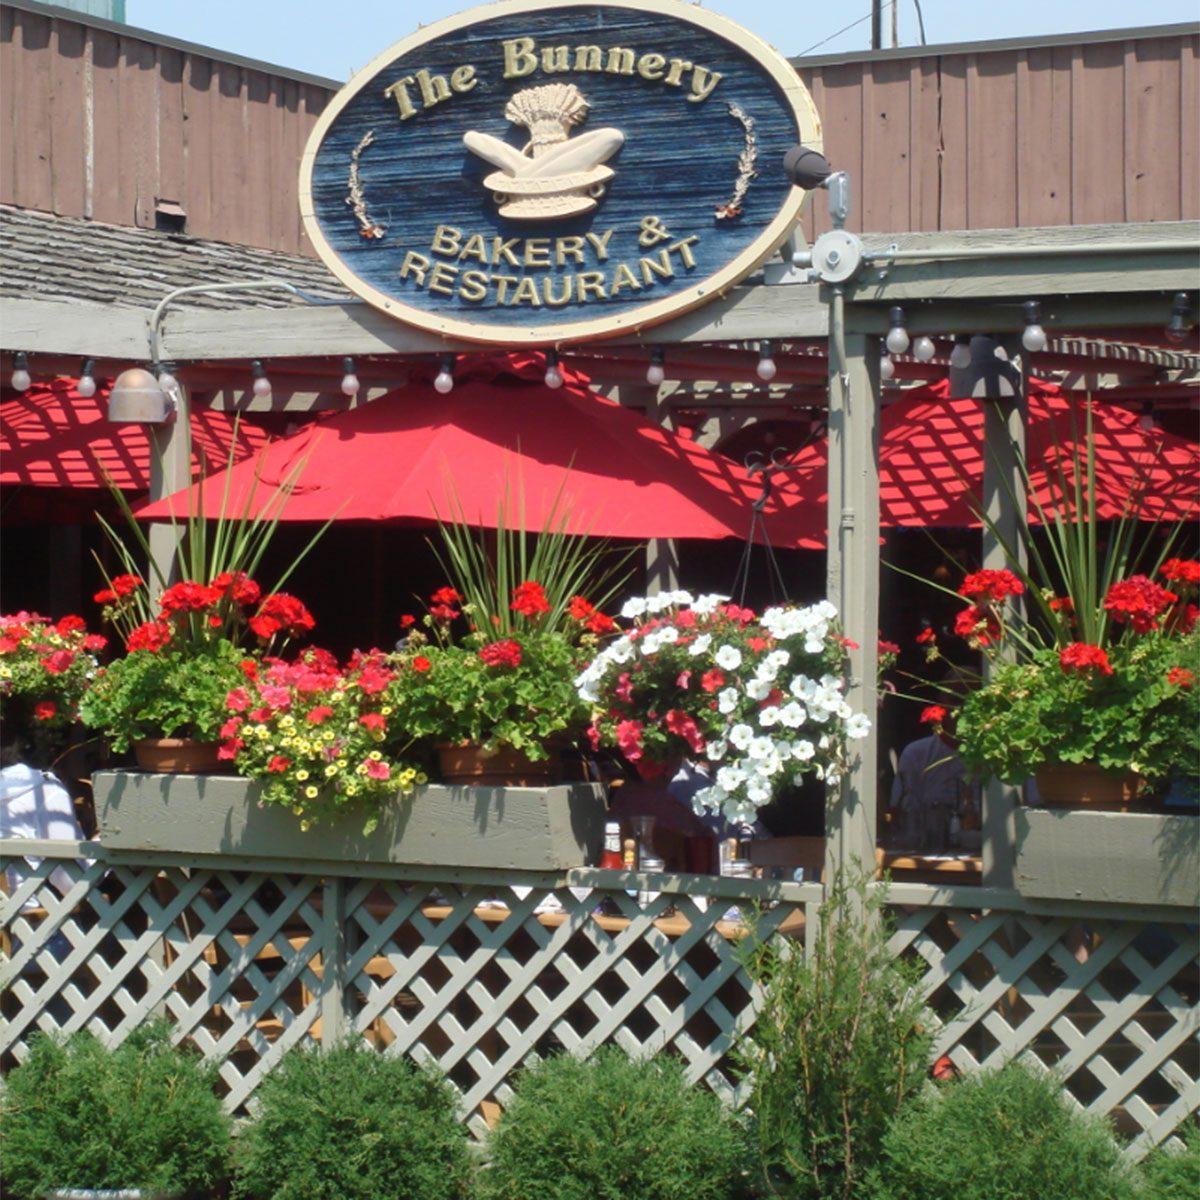 The Bunnery Bakery & Restaurant